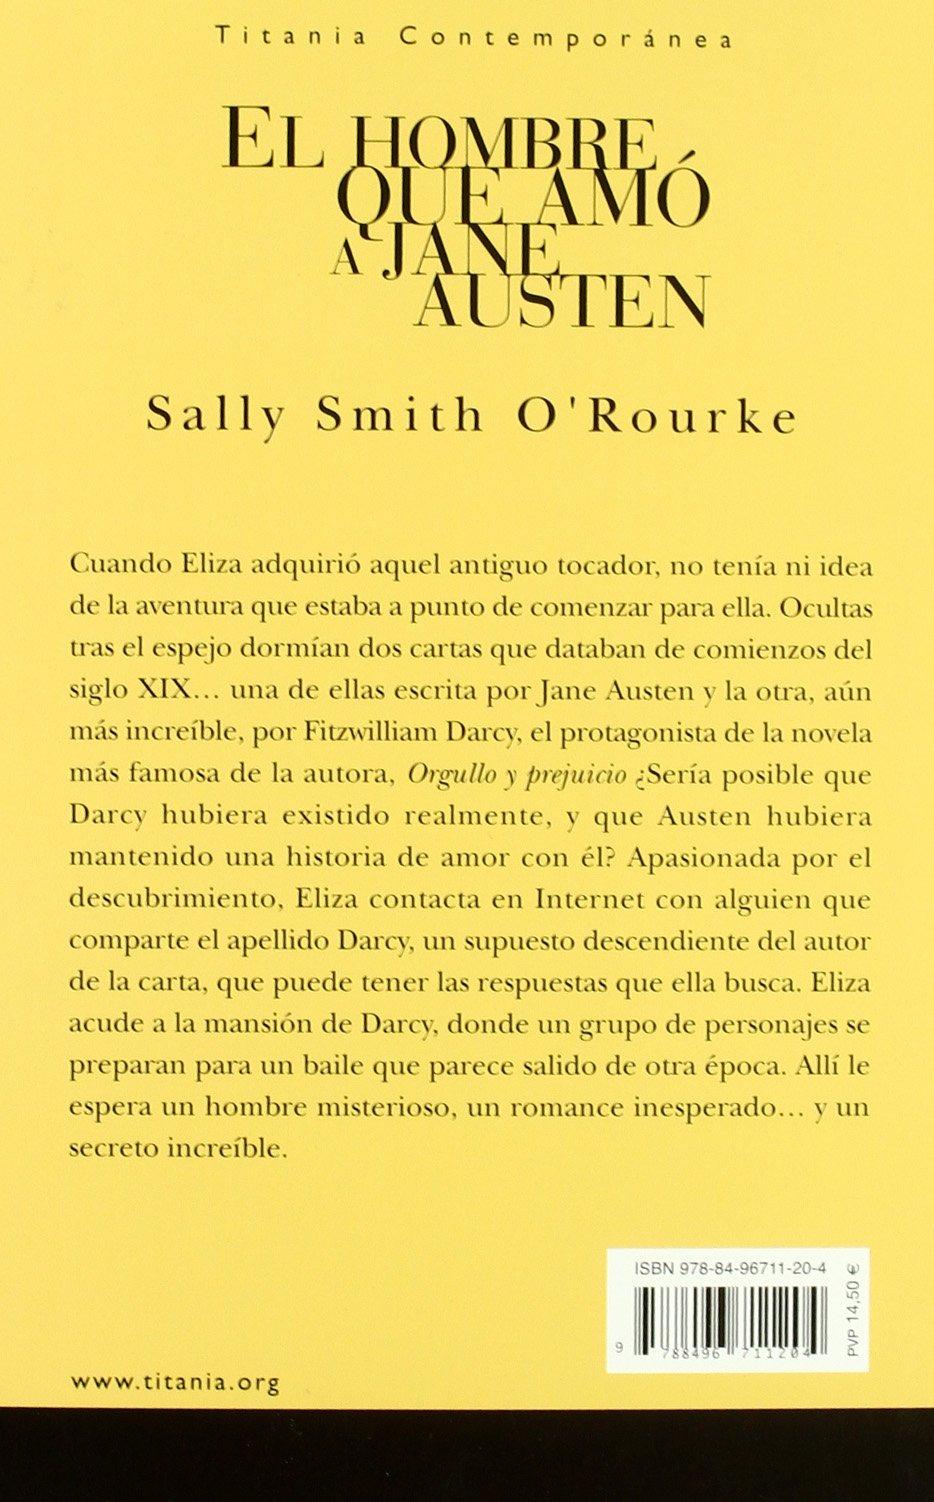 El hombre que amó a Jane Austen (Titania amour): Amazon.es ...